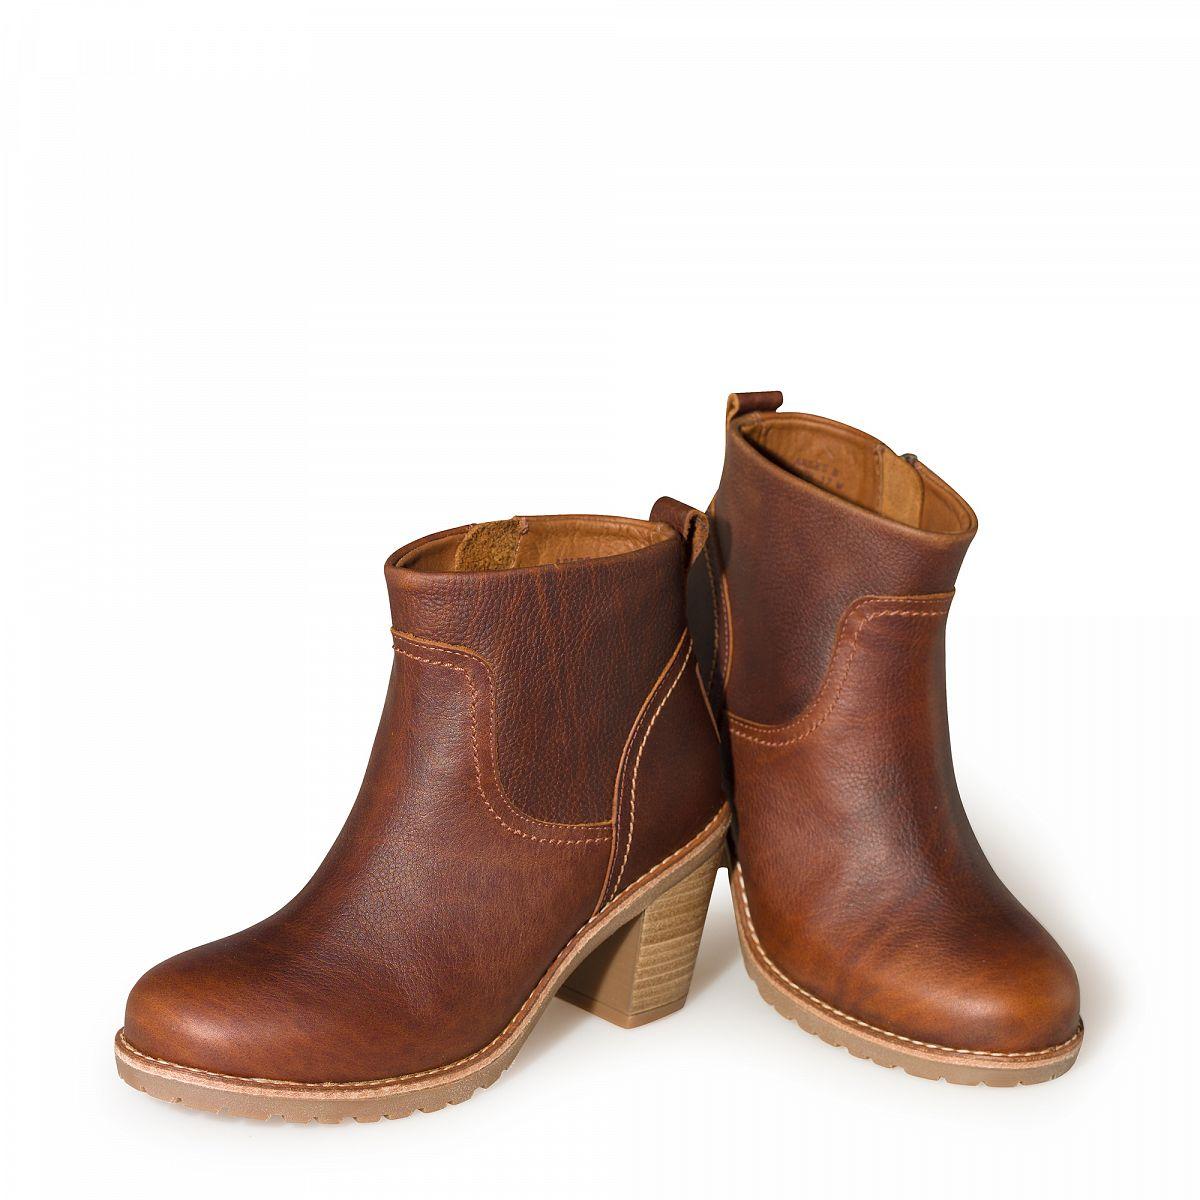 Womens ankle boots arles bark panama jack 174 online shop